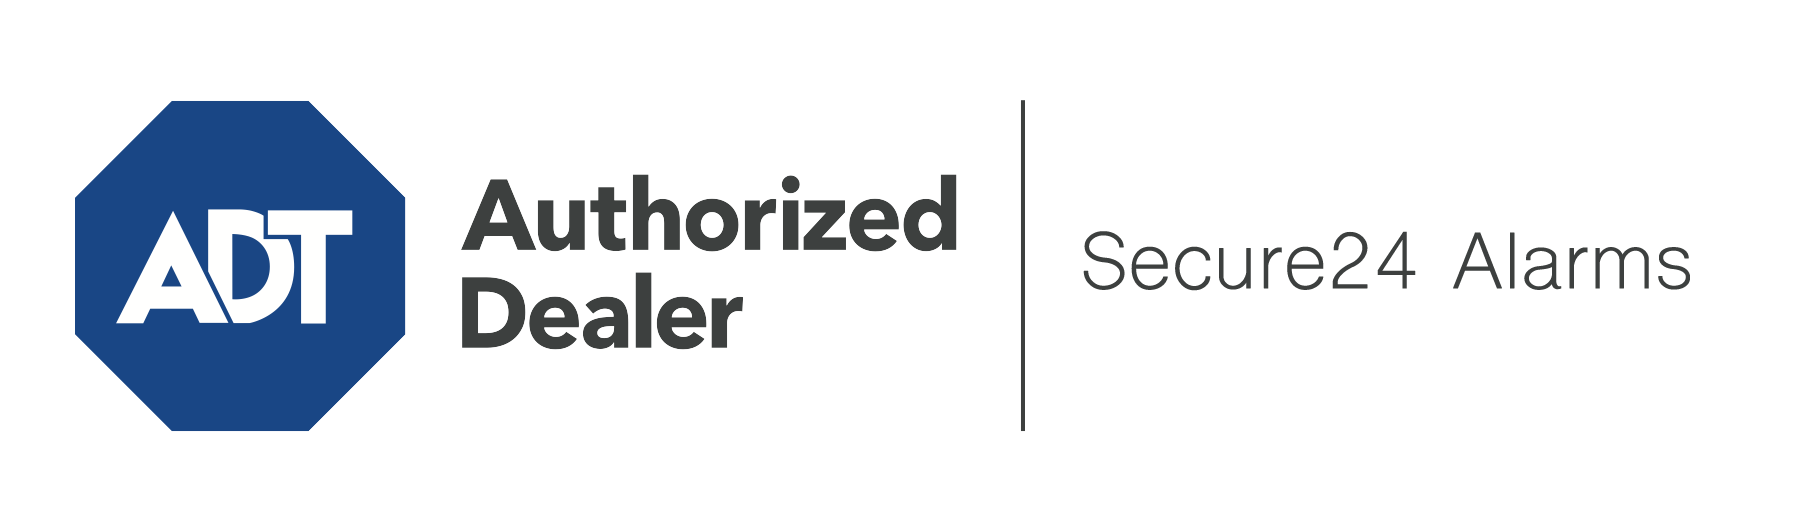 Secure24 logo